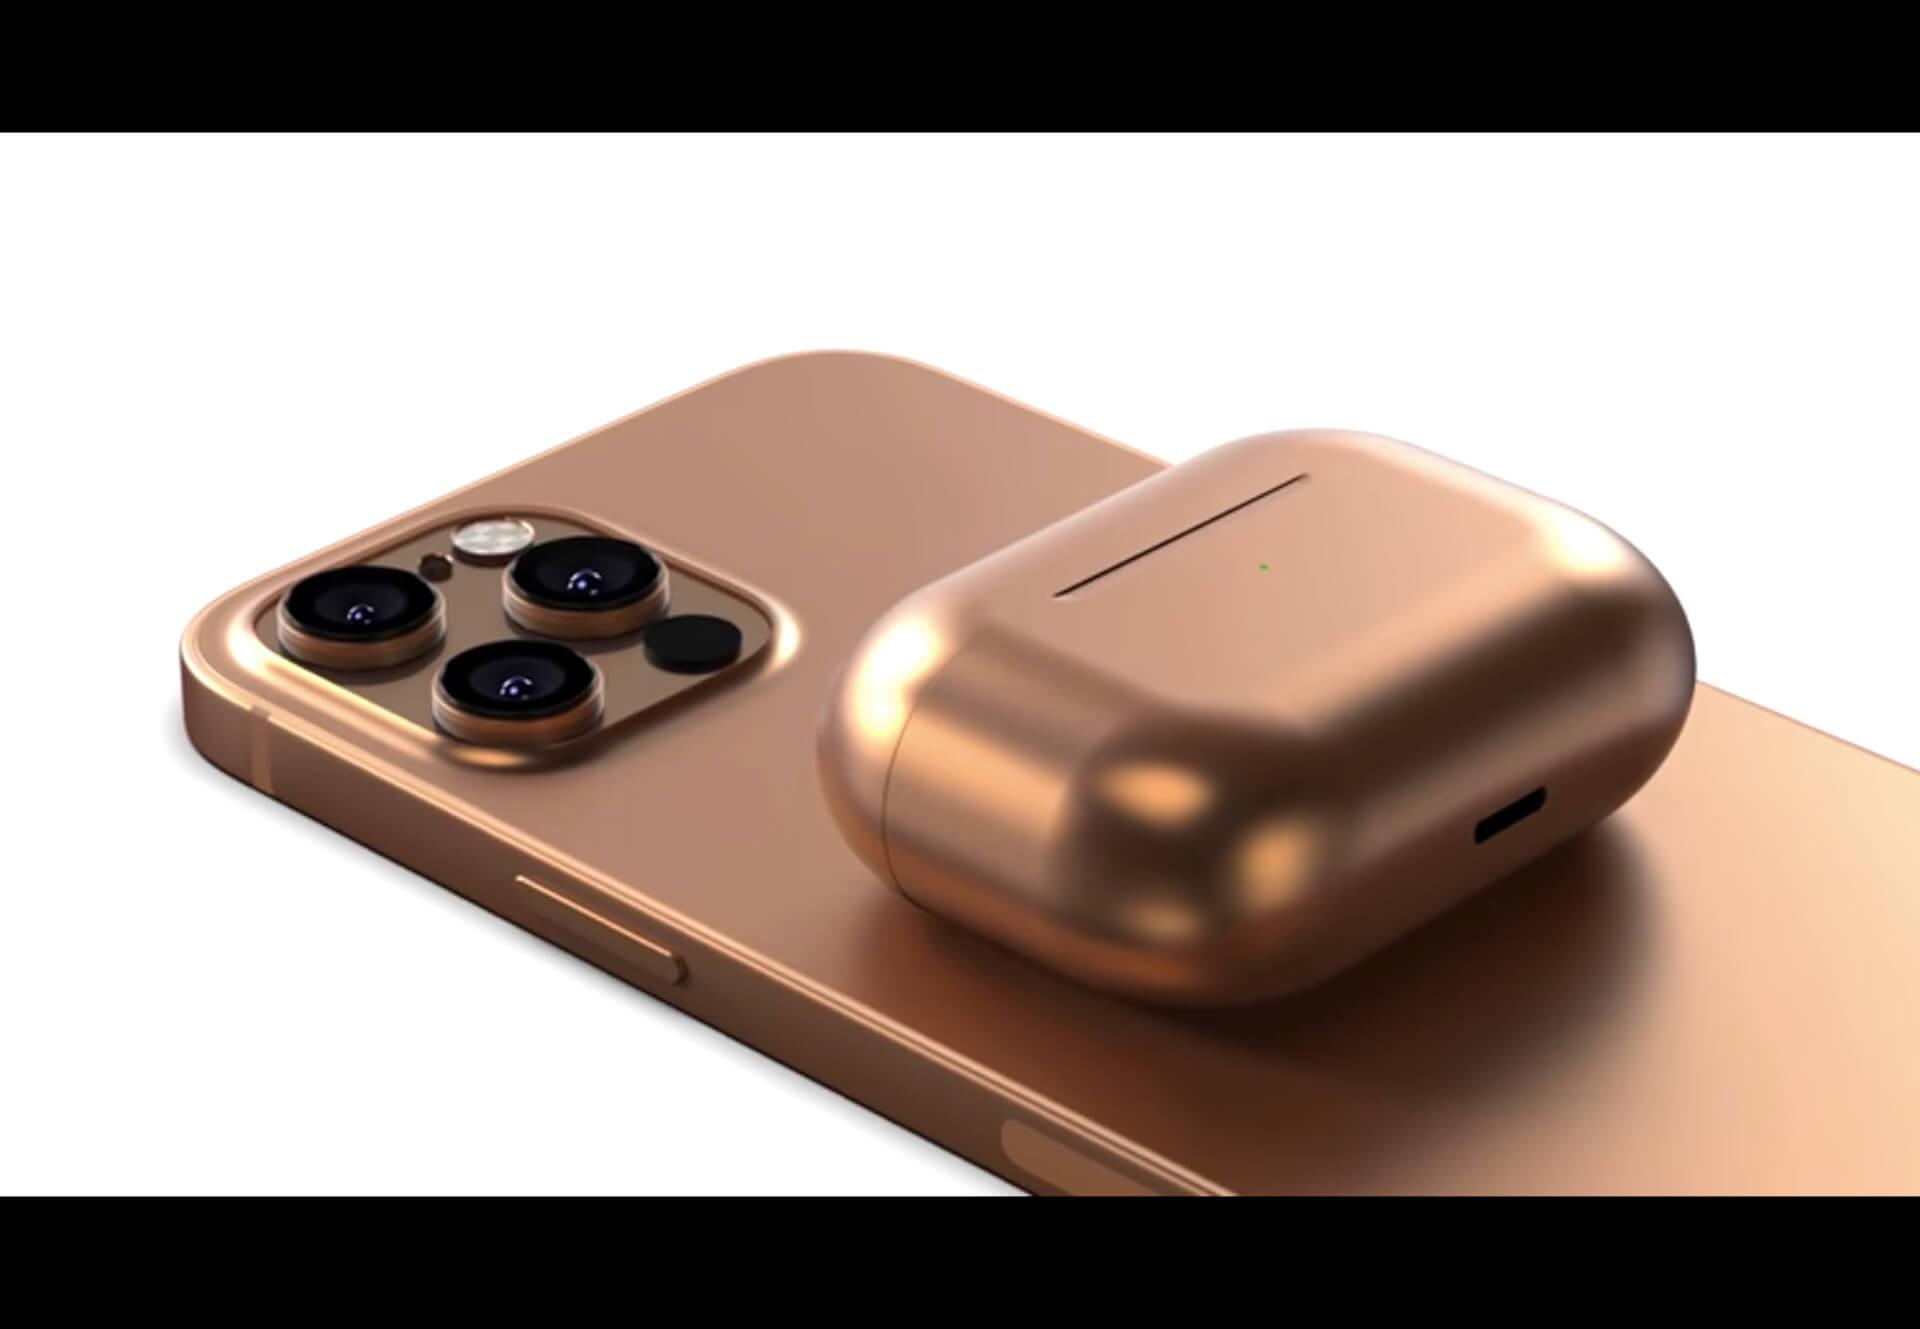 iPhone 12シリーズ搭載の双方向充電機能は5Wでの充電が可能?AirTagsも充電できる可能性 tech201029_iphone12_main